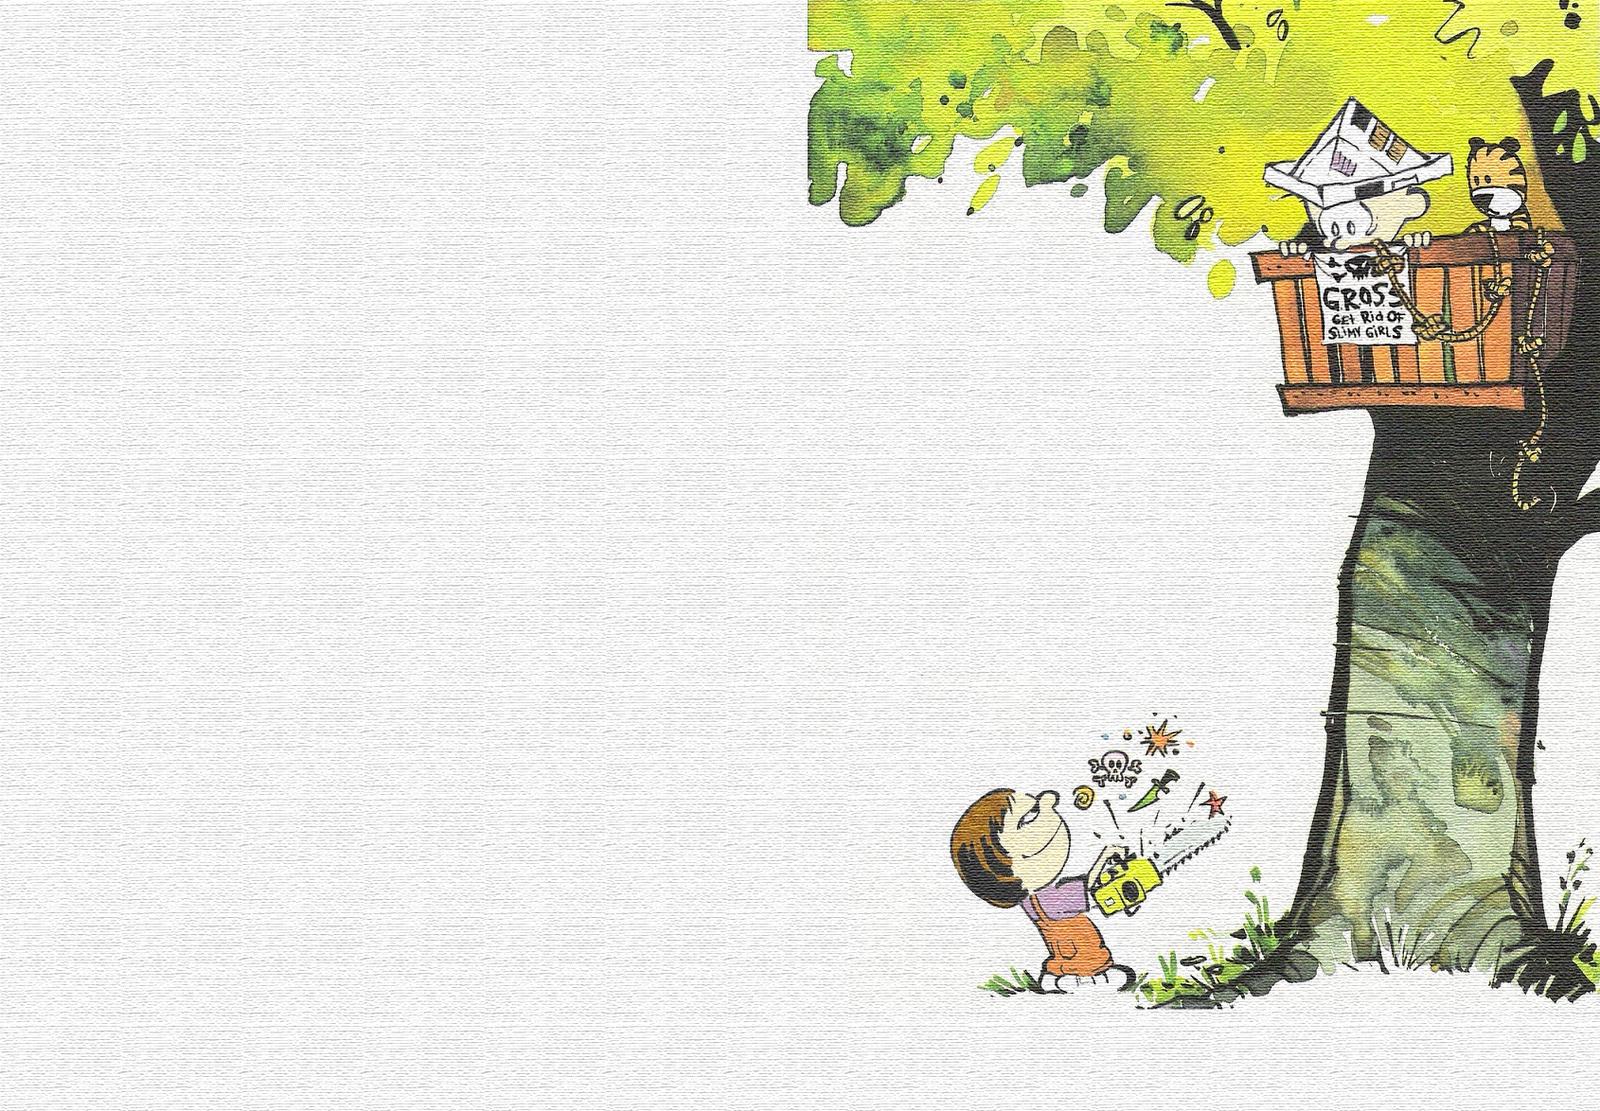 Free Download Calvin And Hobbes Wallpaper The Desktop Wallpaper